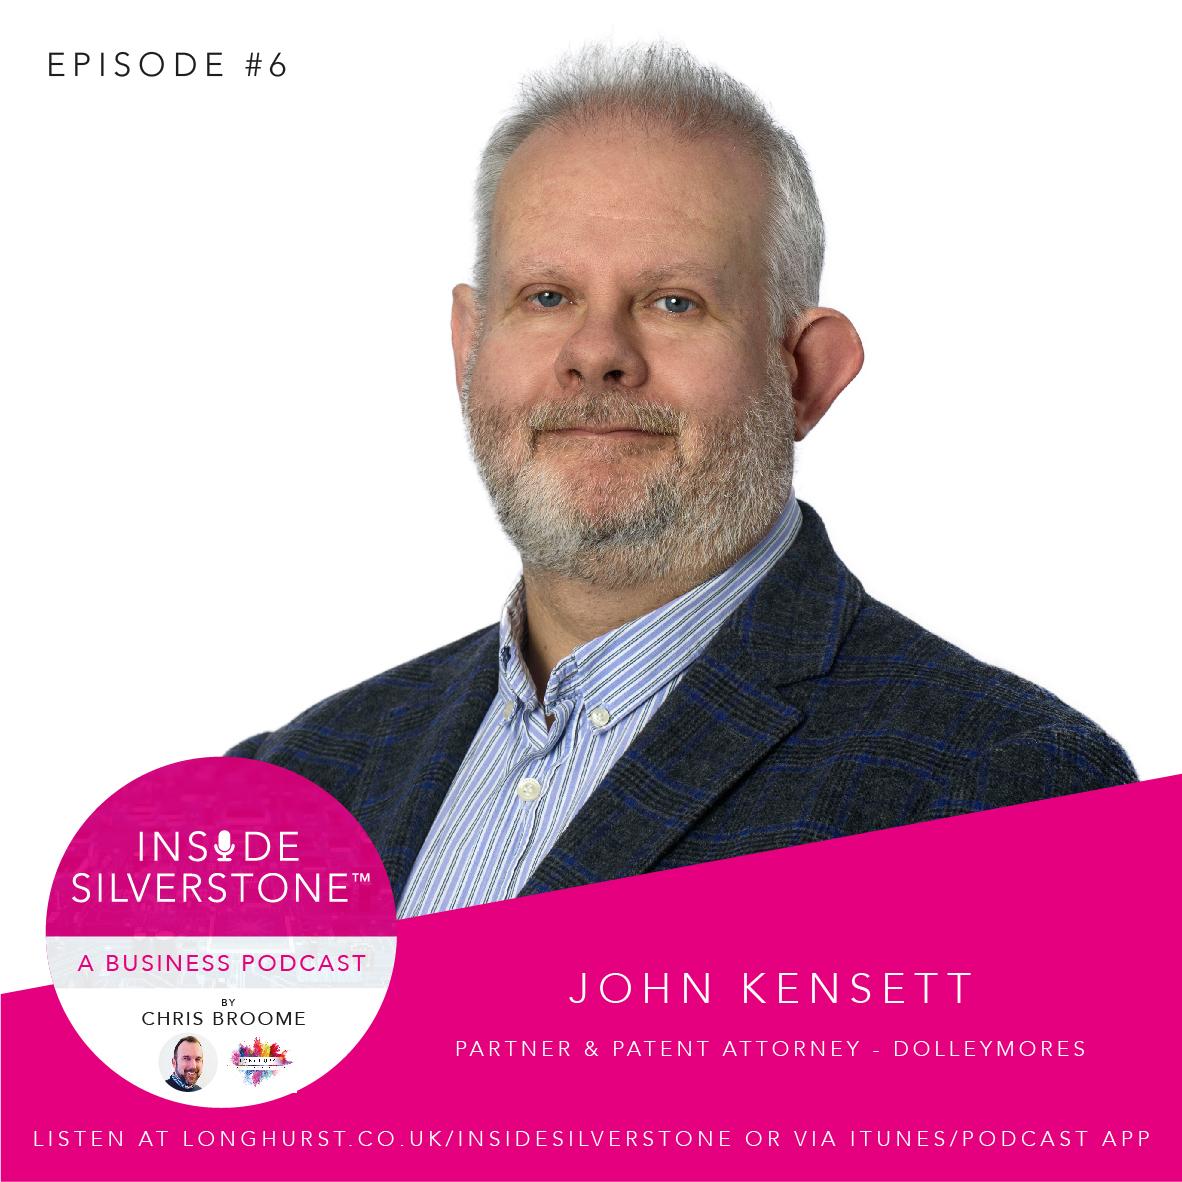 John Kensett - Partner, Intellectual Property & Patent Attorney